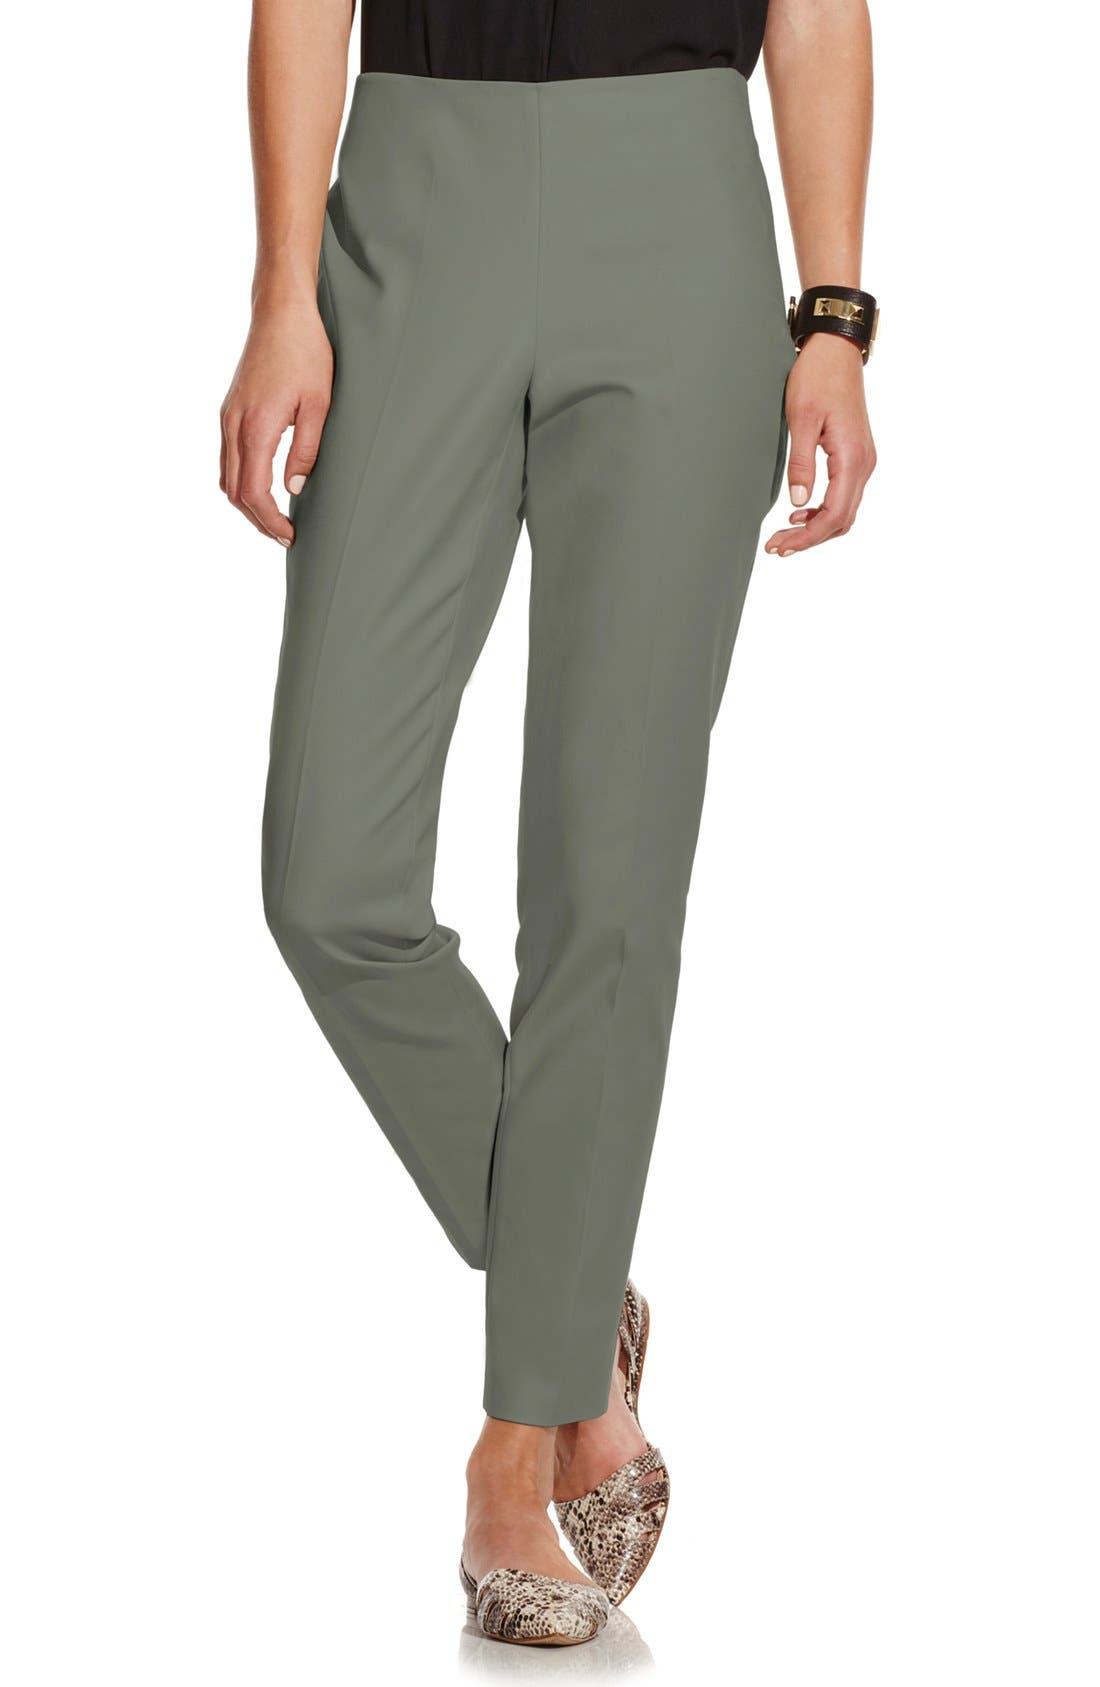 Alternate Image 1 Selected - Vince Camuto Side Zip Skinny Pants